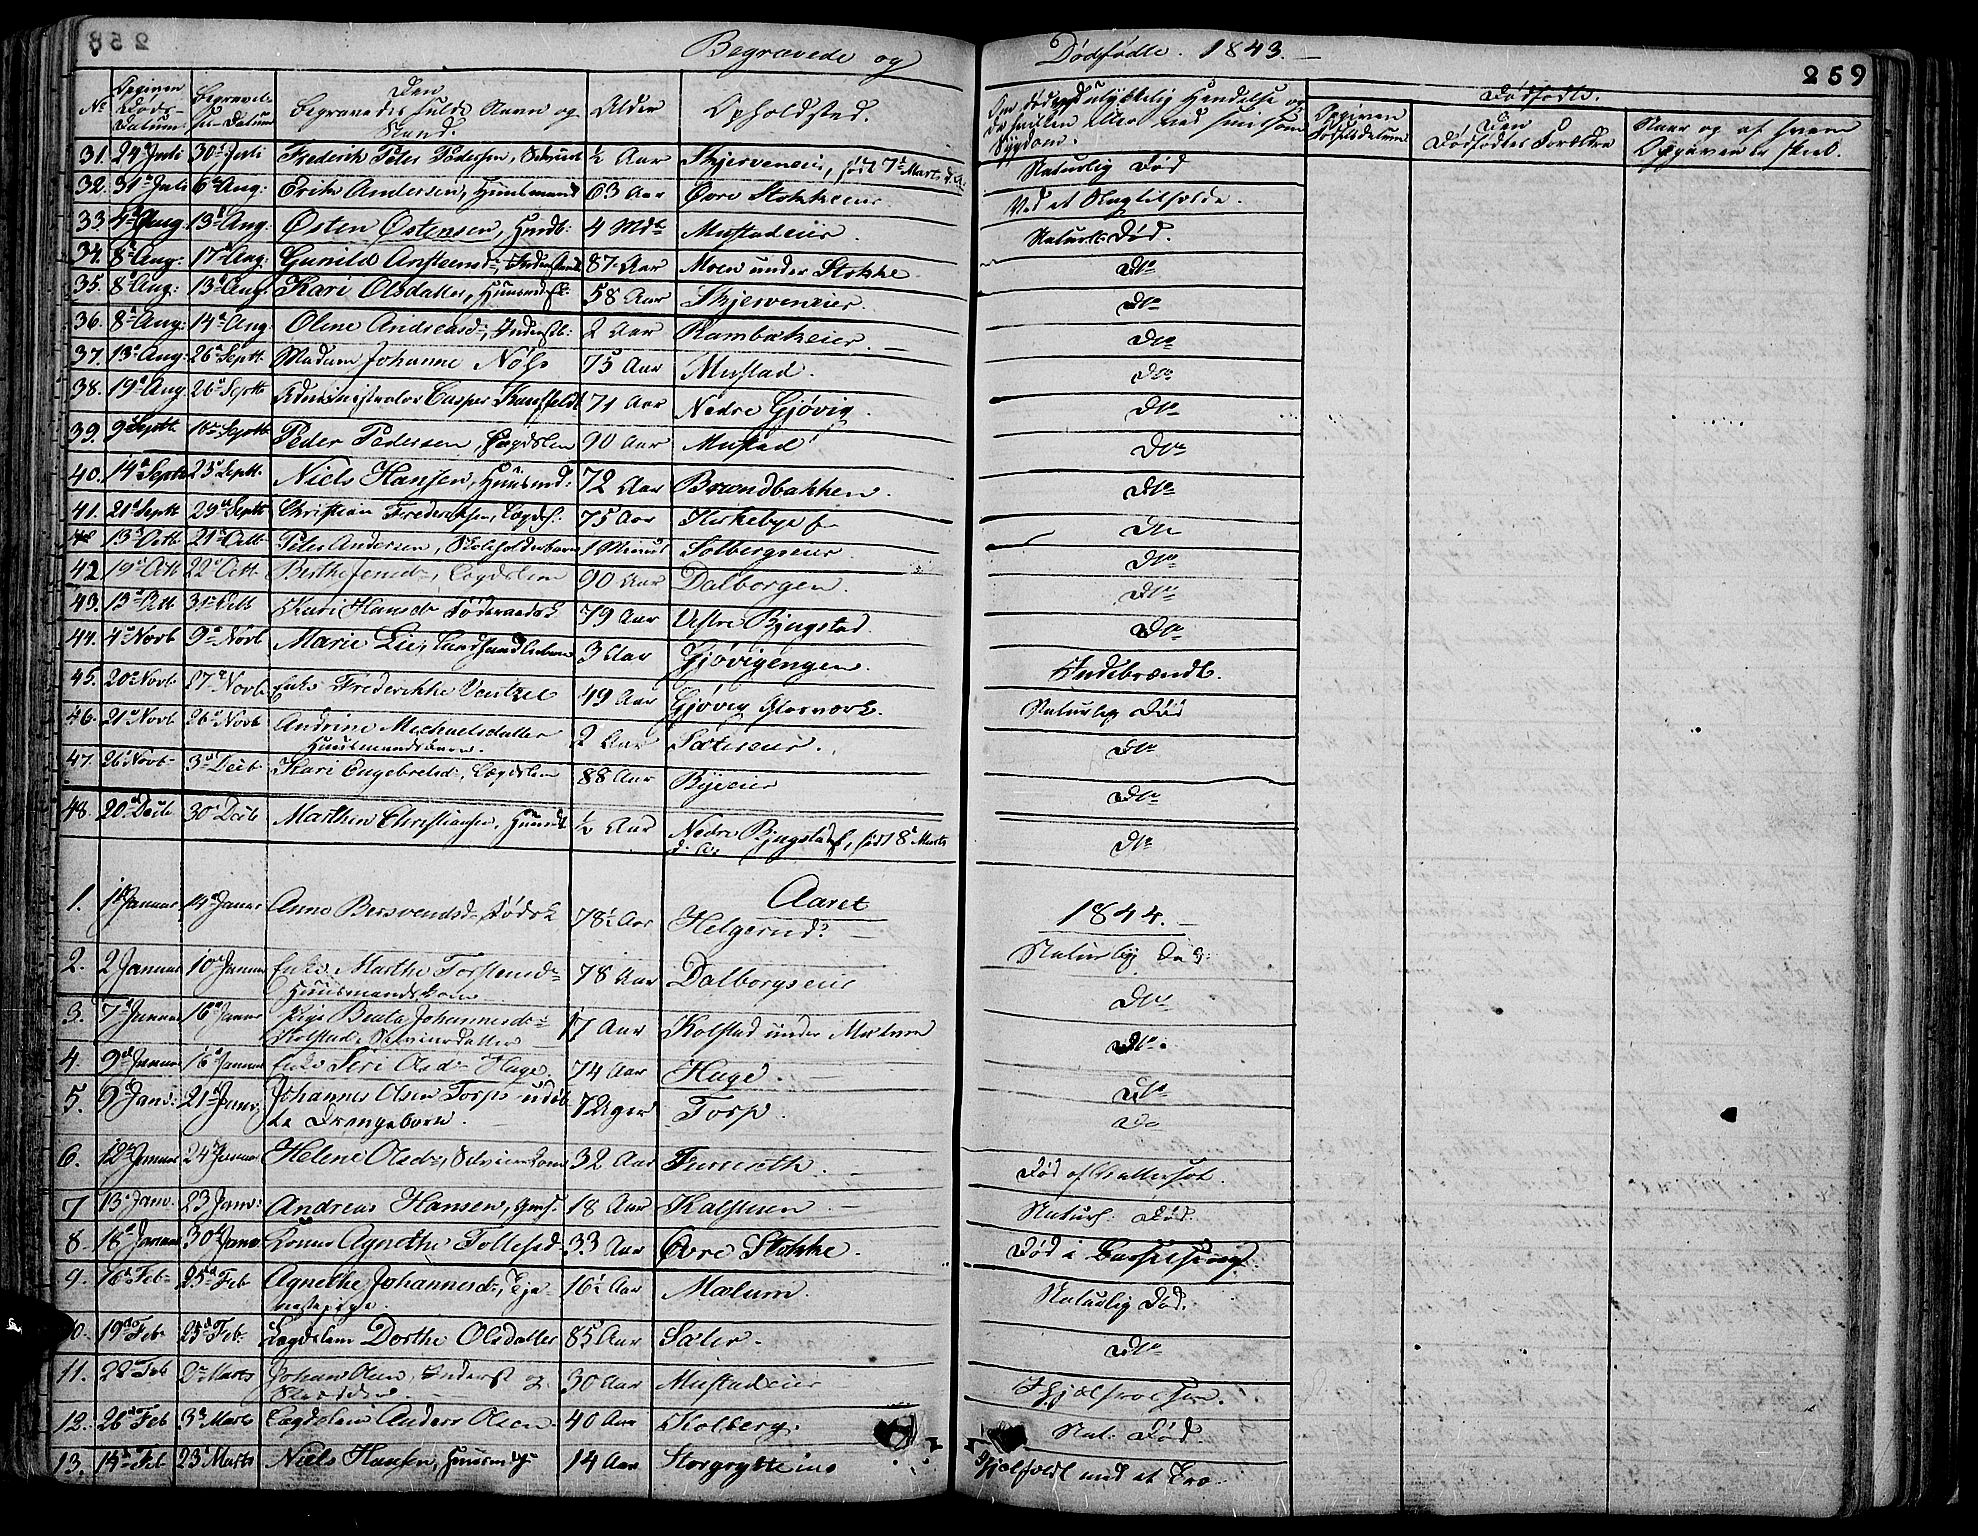 SAH, Vardal prestekontor, H/Ha/Hab/L0004: Klokkerbok nr. 4, 1831-1853, s. 259